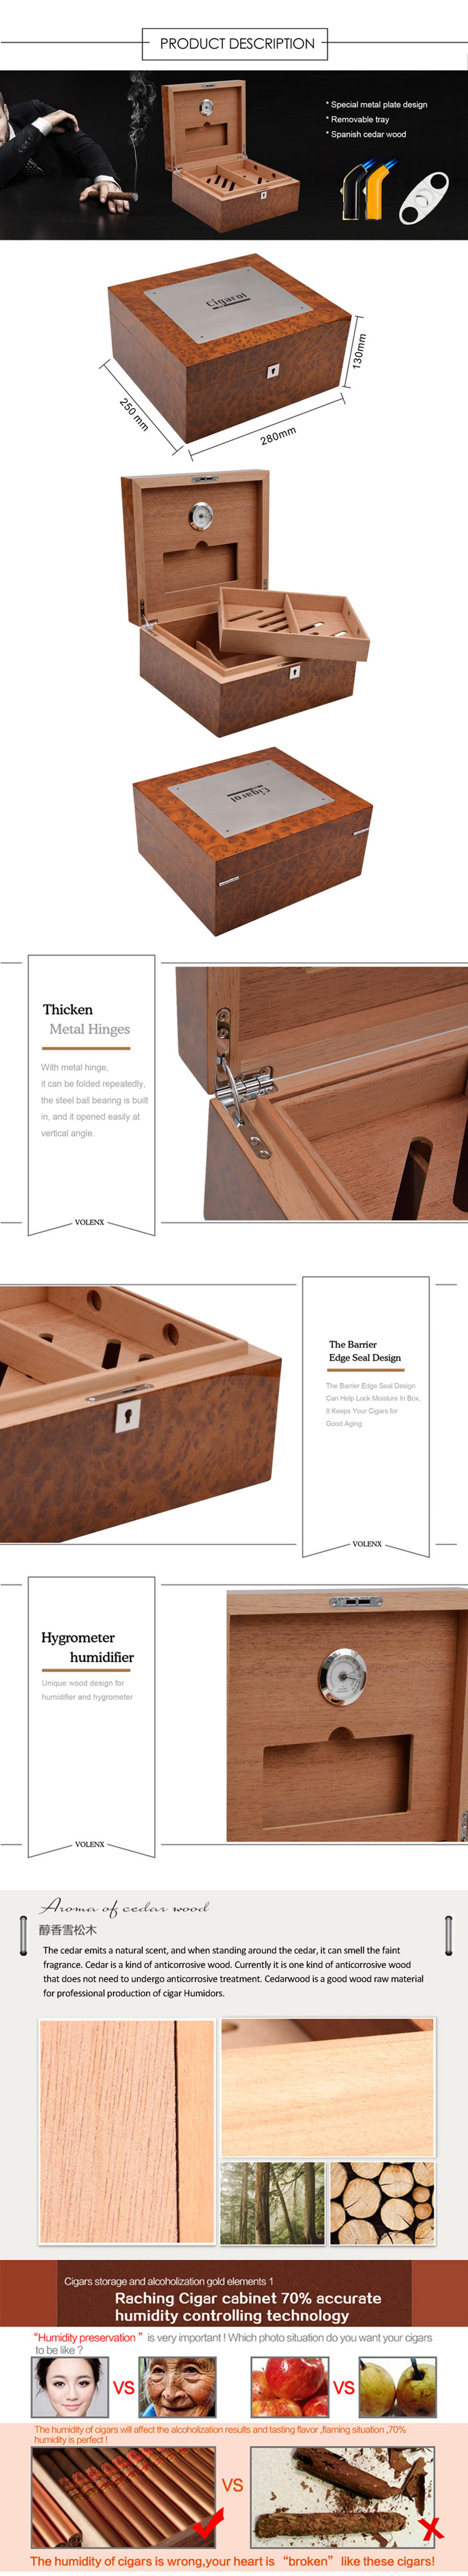 Spanish cedar veneer one wooden tray cigar humidor box and accessories